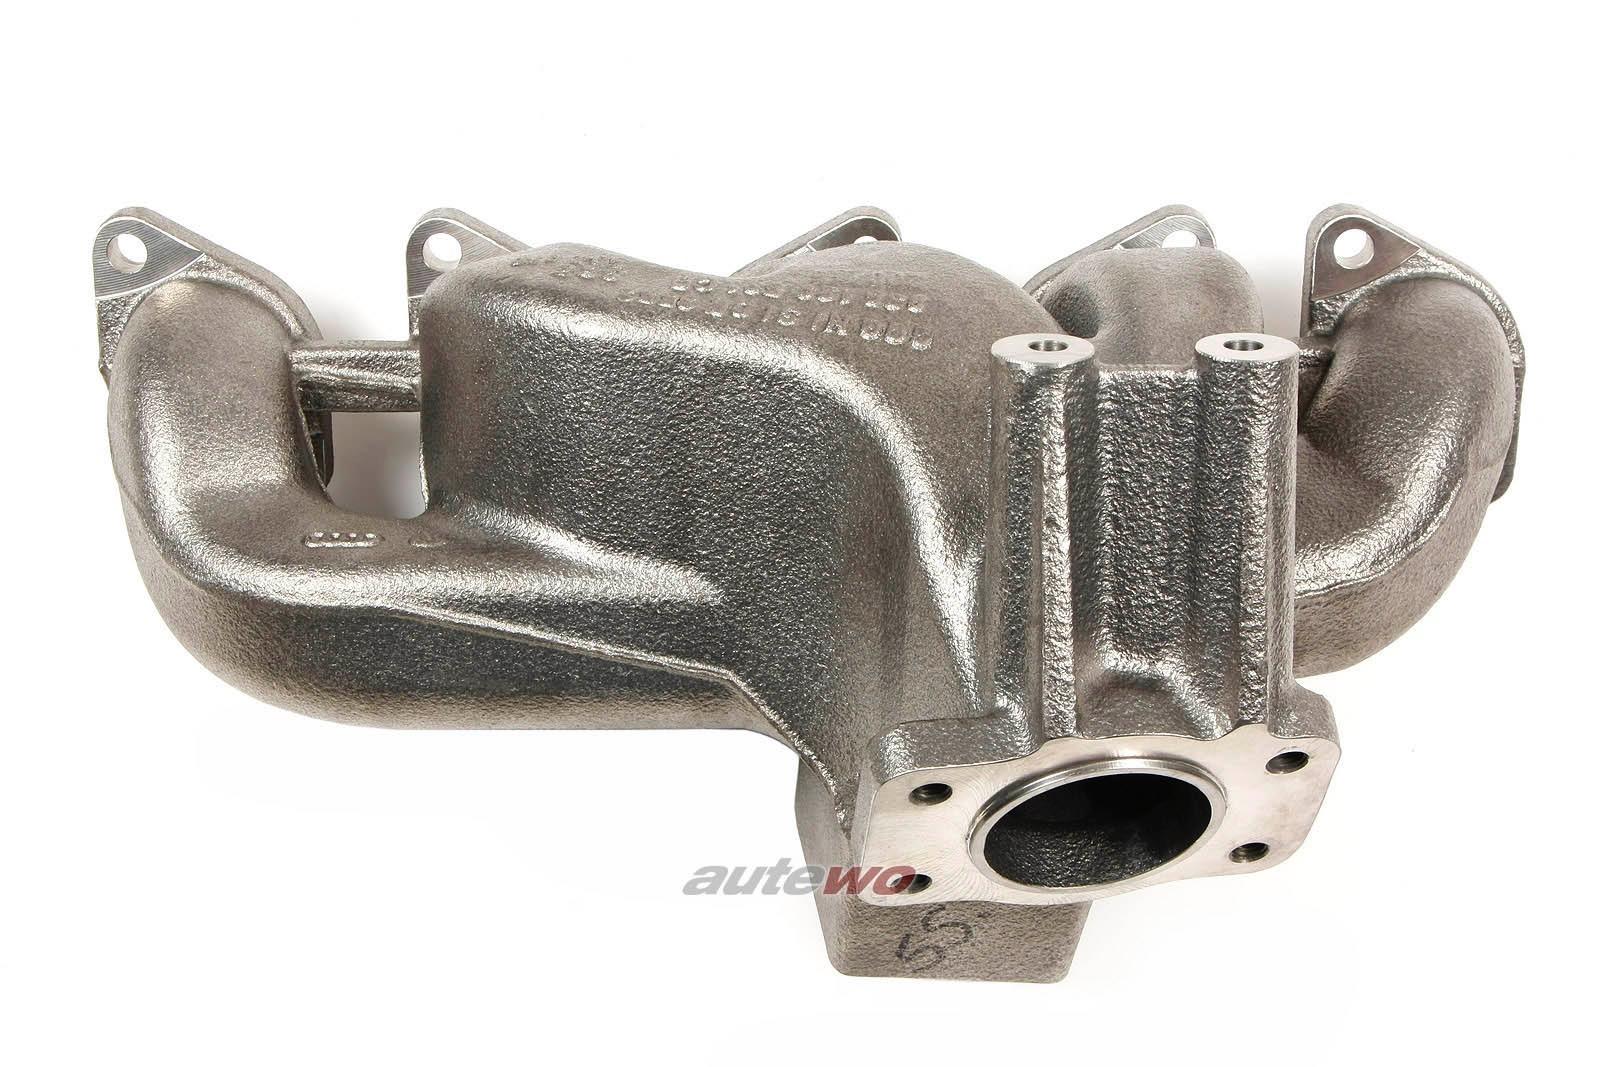 035129591CB NEU Audi Sportquattro 2.2l 306PS 20V Turbo KW Abgaskrümmer